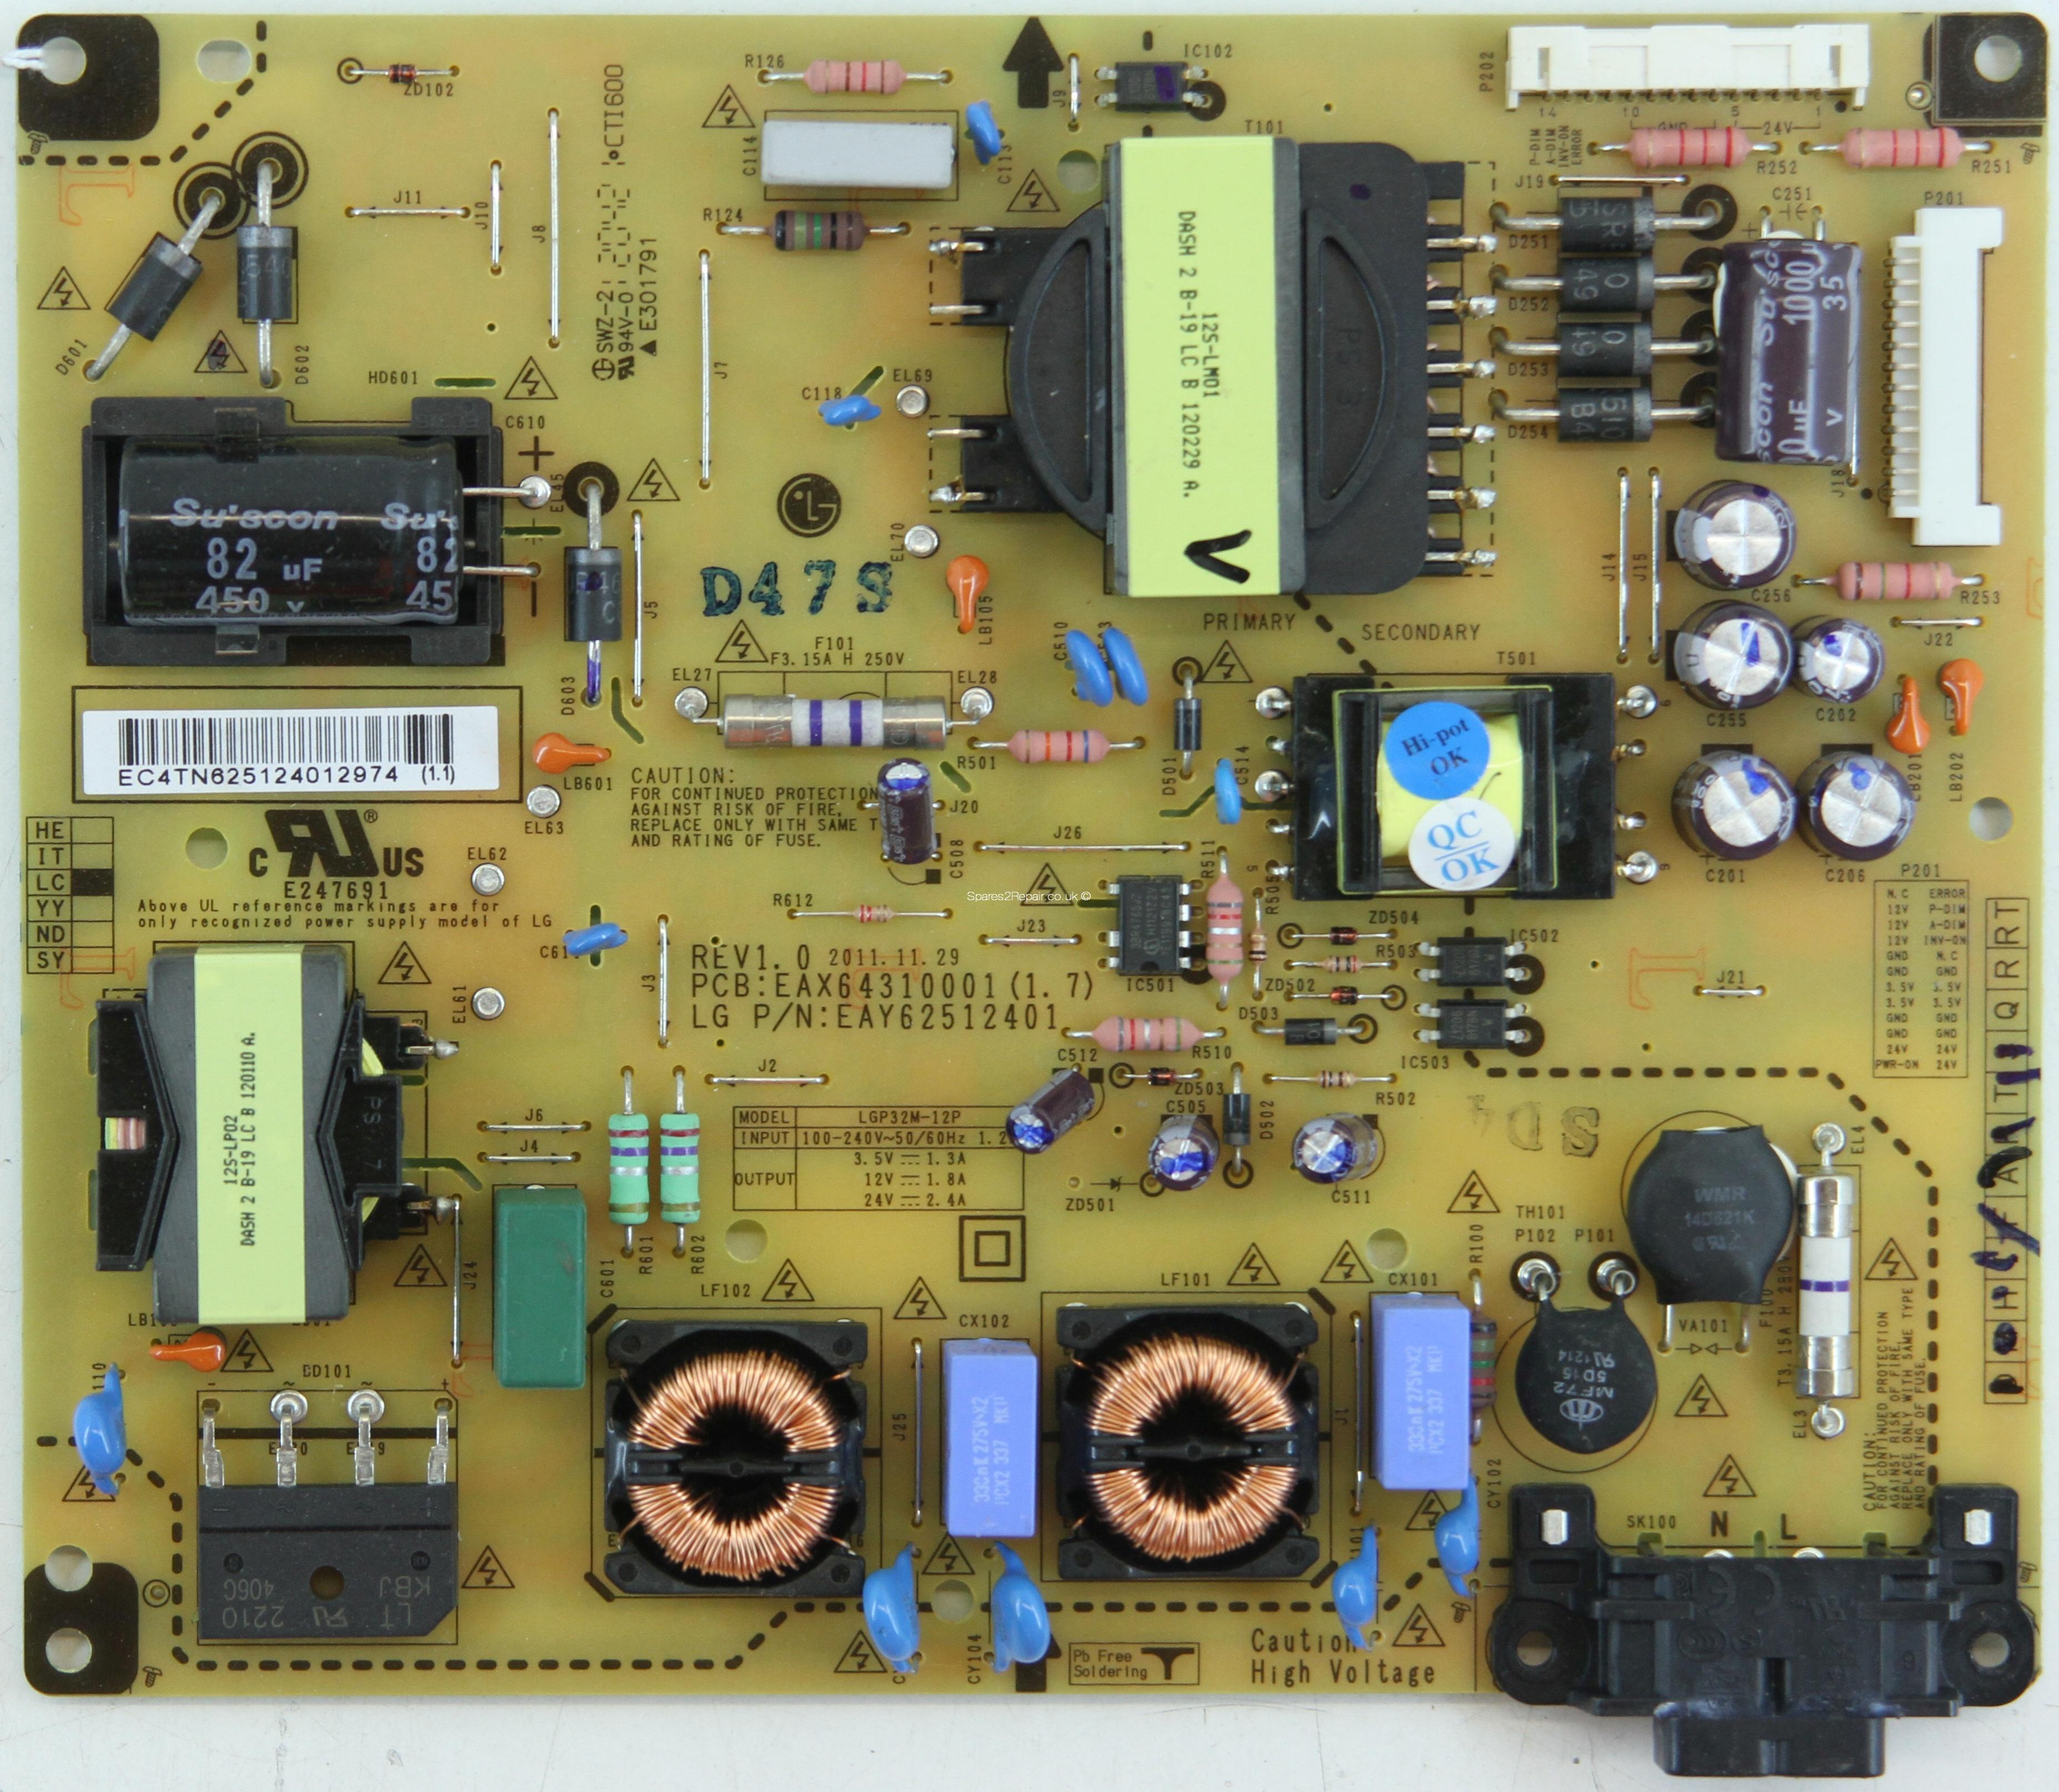 Комплект socket 775 gigabyte ga-8i945gmf-rh + celeron 253ghz + кулер